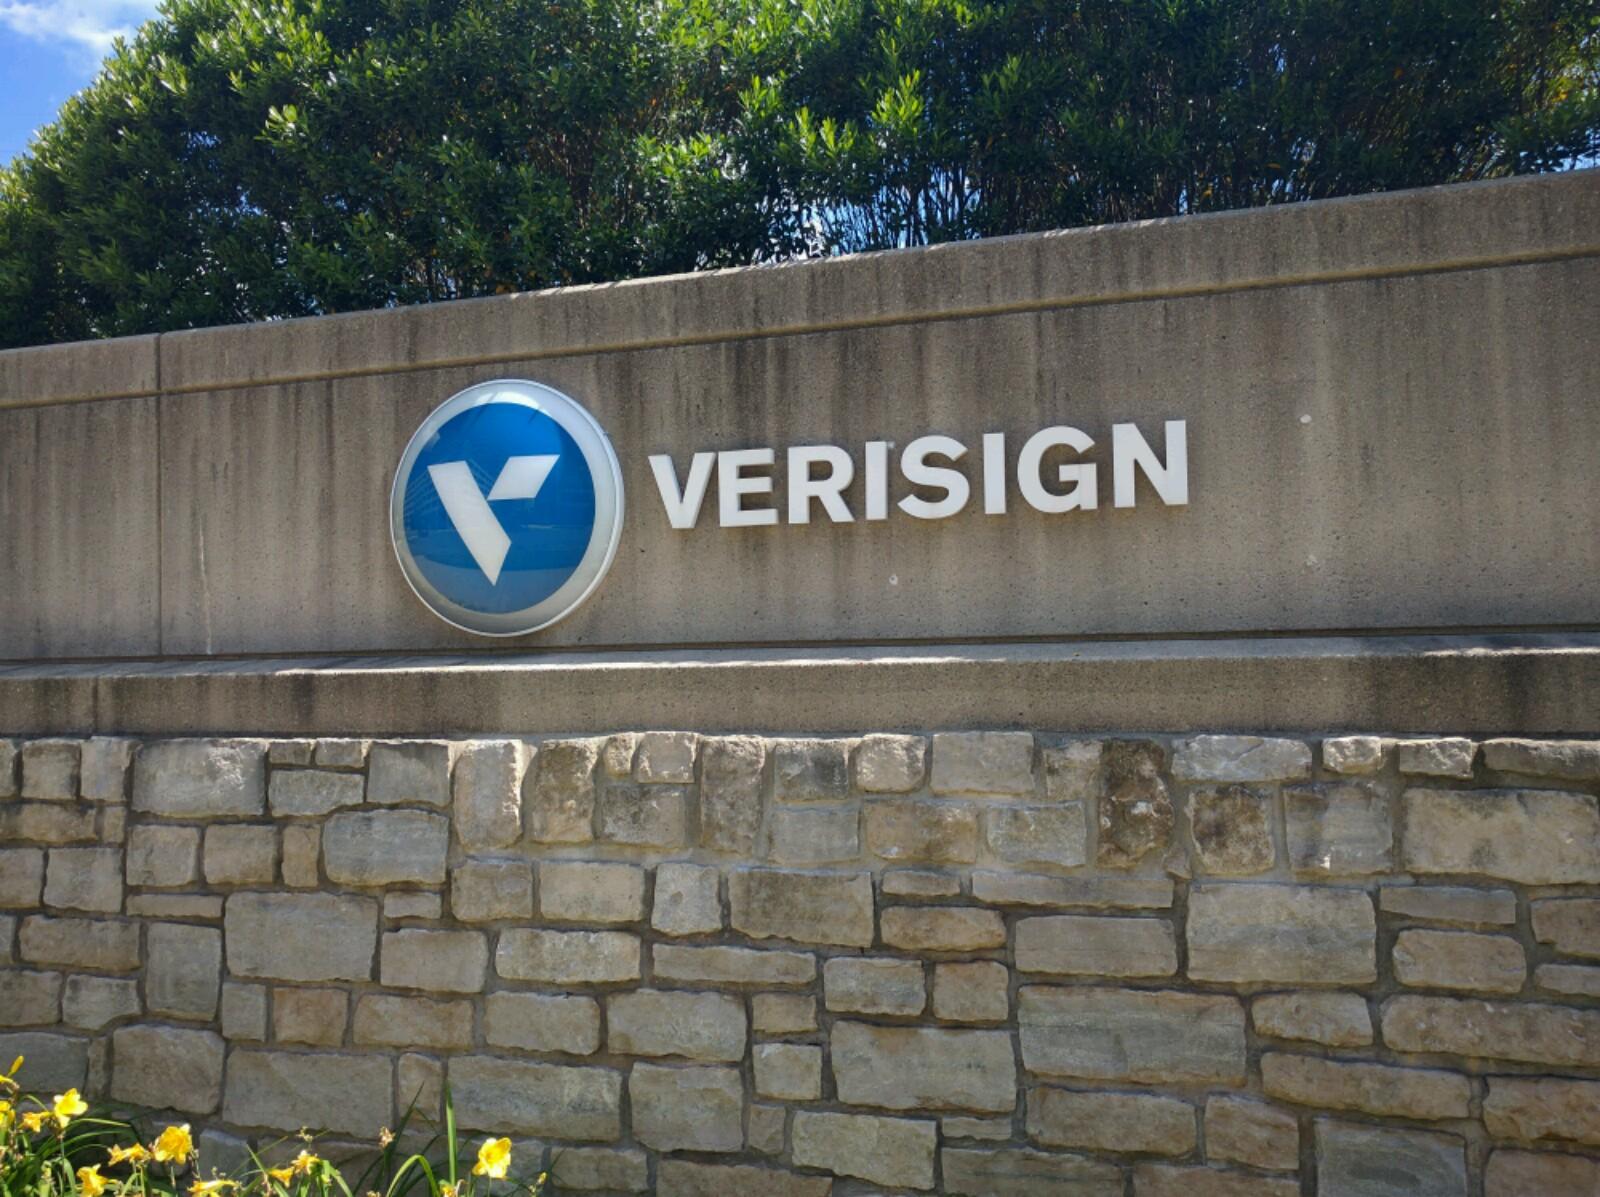 Entrance to VerSign's corporate headquarters in Reston, Virginia.